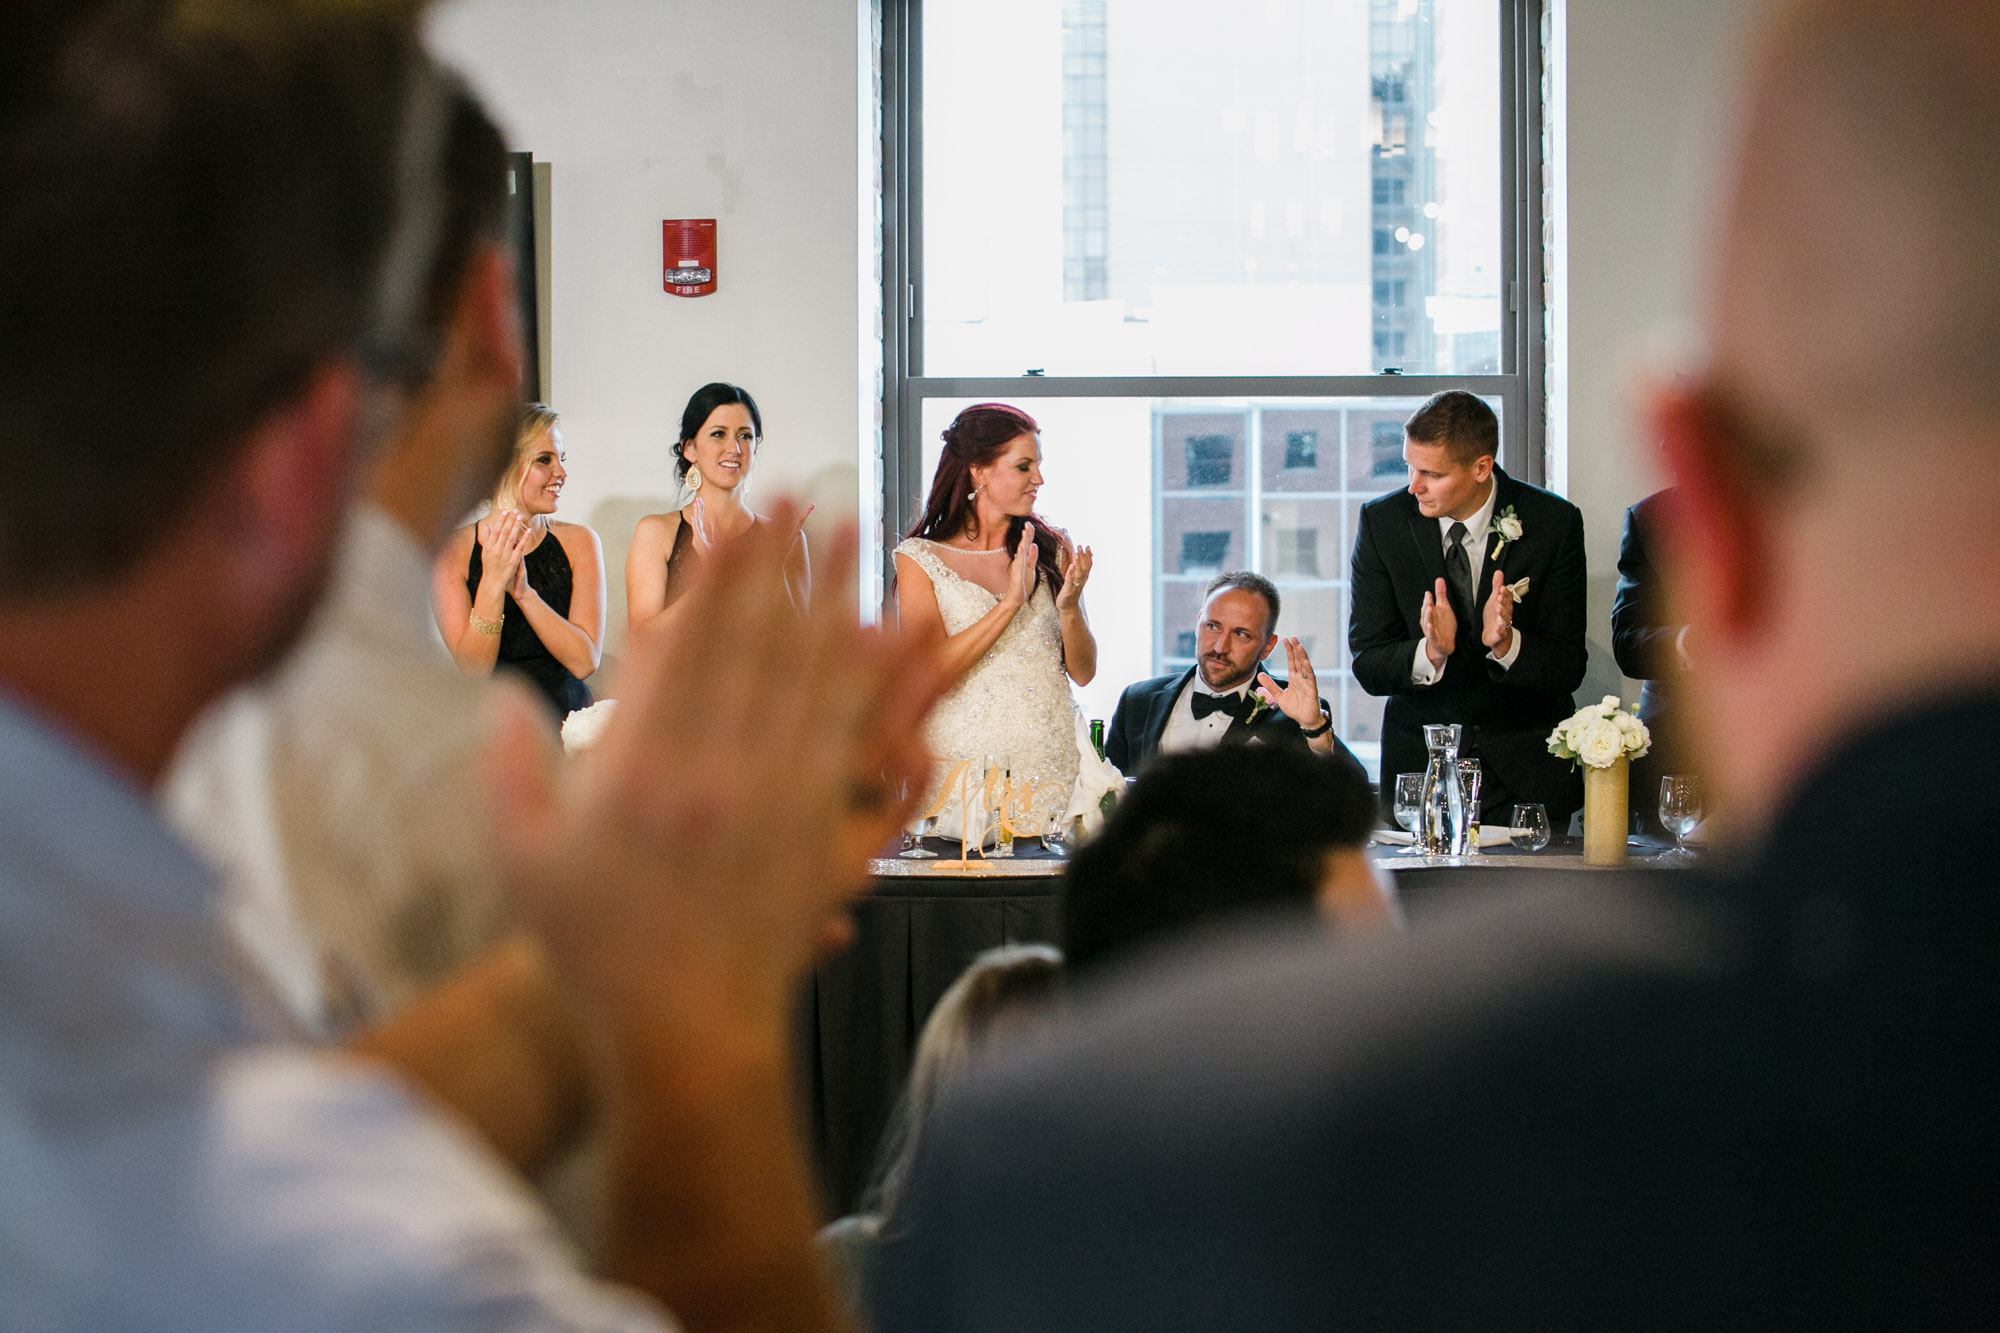 hensville-wedding-downtown-toledo-ohio (92 of 103).jpg